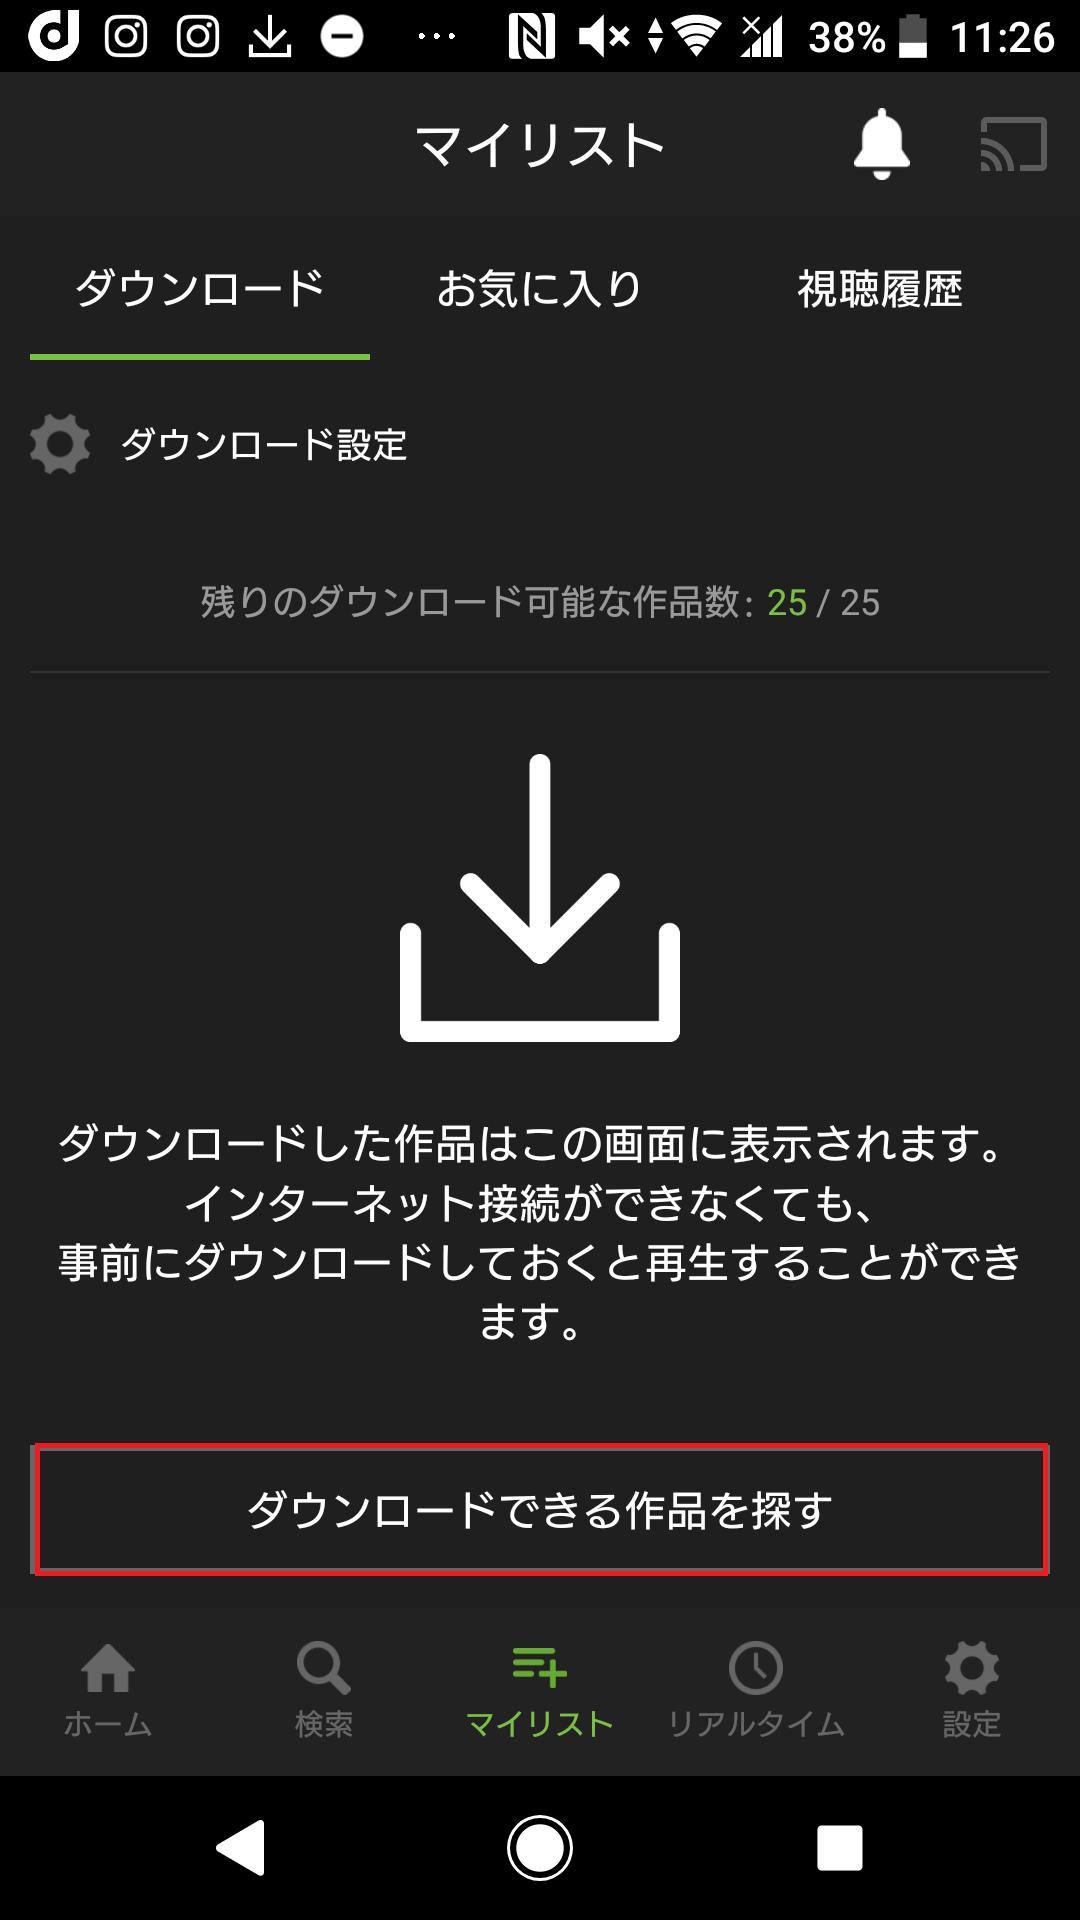 huluでダウンロード可能な動画や作品を一覧で確認する方法の手順画像_3